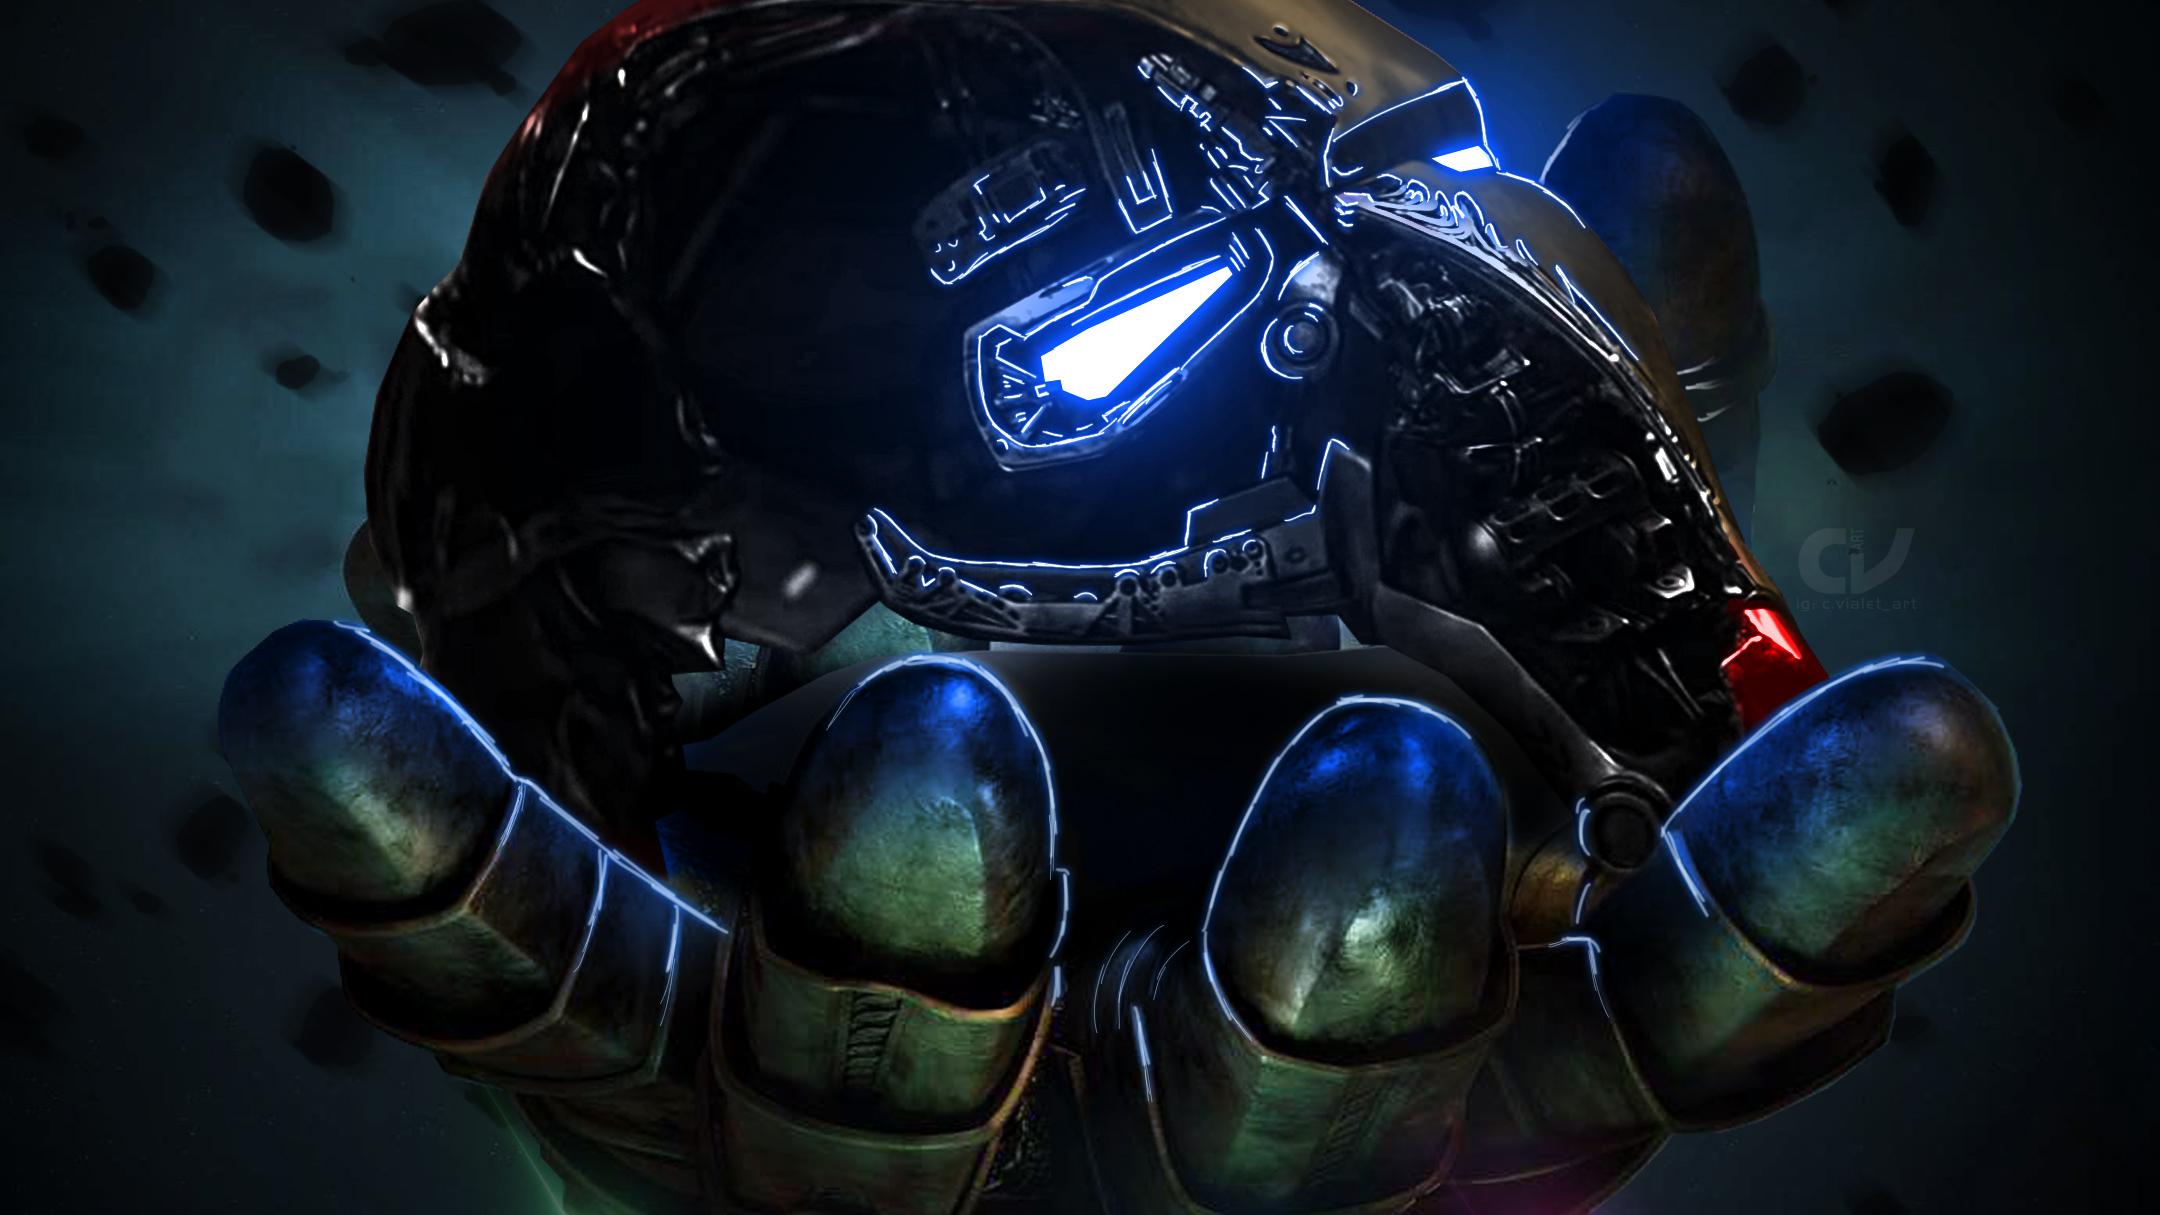 Avengers Endgame Hd Wallpaper Background Image 2160x1215 Id